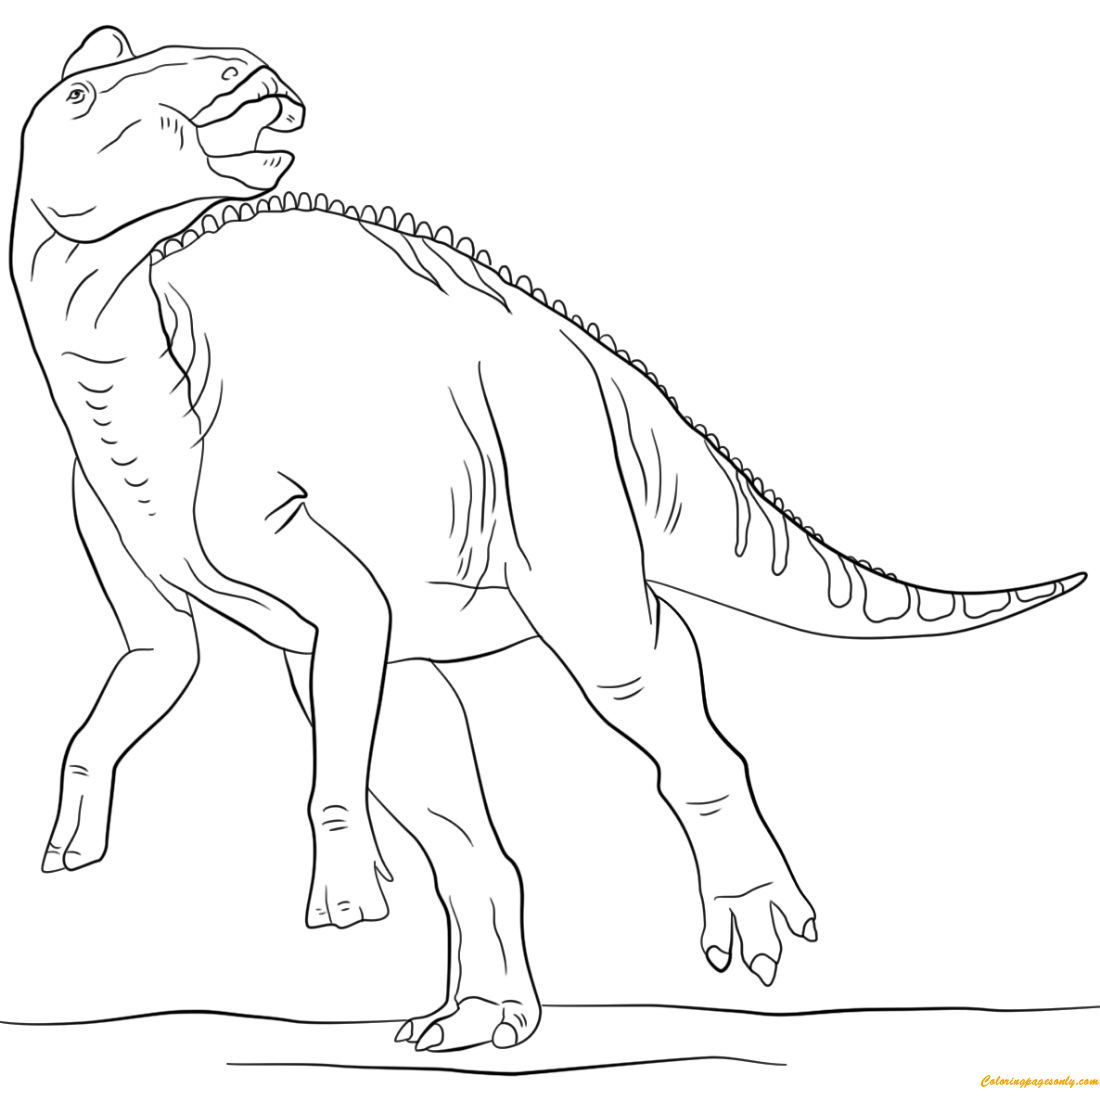 Jurassic Edmontosaurus Coloring Page